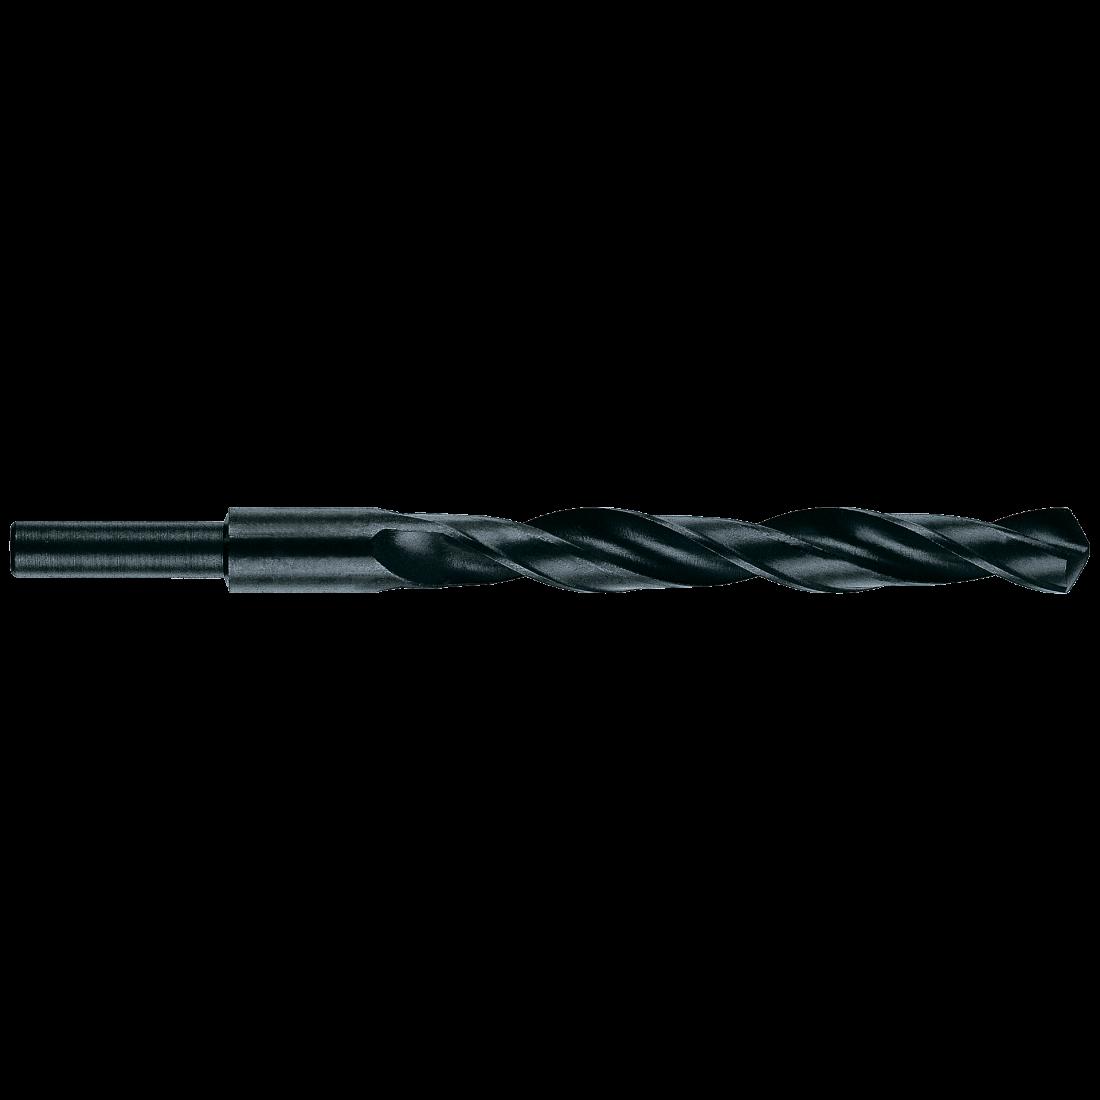 Сверло по металлу Heller HSS cо ступенчатым хвостовиком 13,5х108х160мм